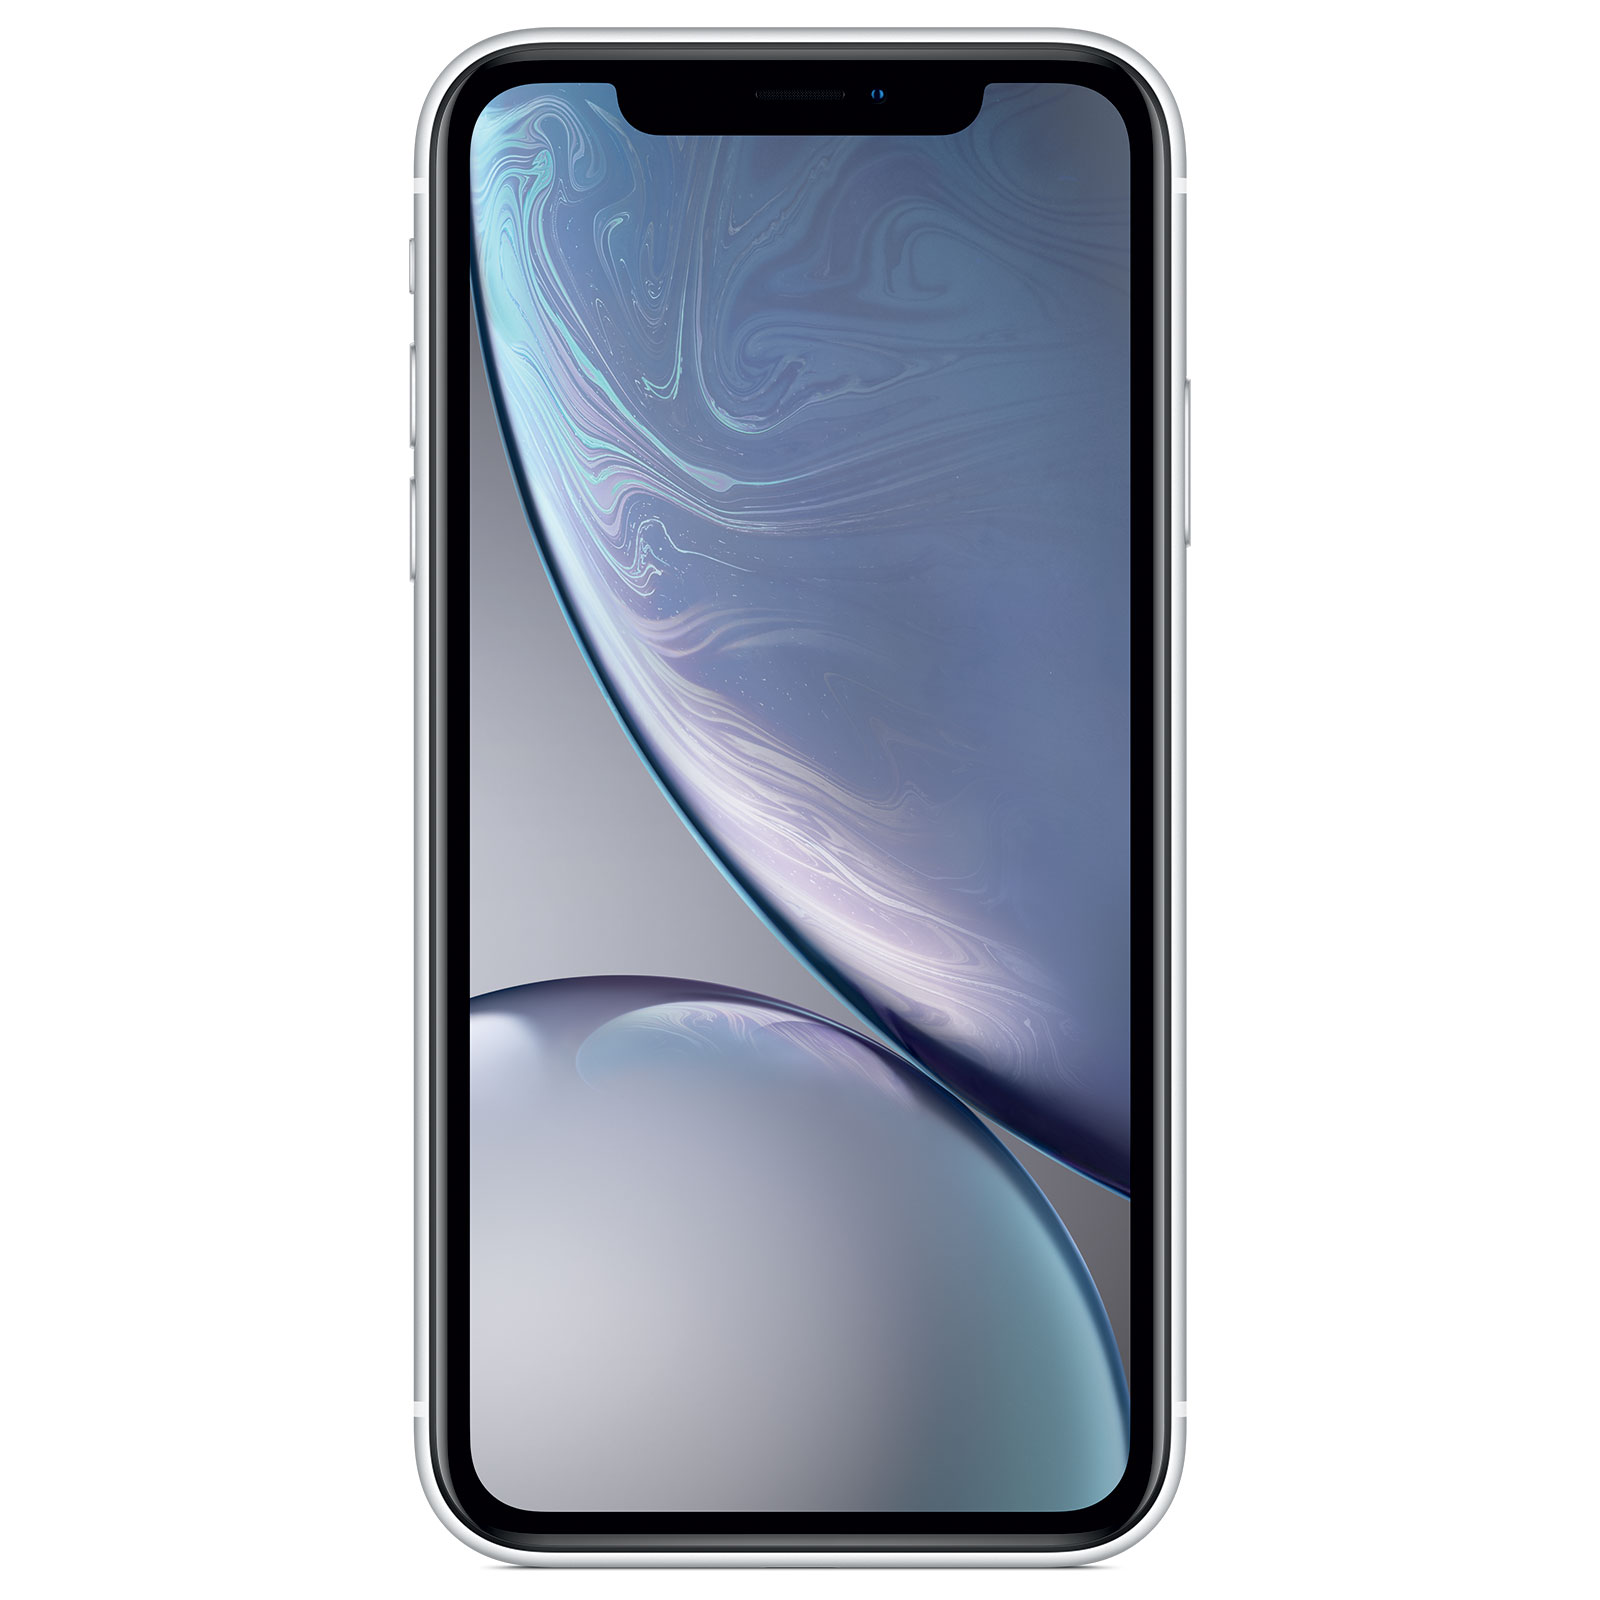 "Mobile & smartphone Apple iPhone XR 256 Go Blanc Smartphone 4G-LTE Advanced IP67 Dual SIM - Apple A12 Bionic Hexa-Core - RAM 3 Go - Ecran 6.1"" 828 x 1792 - 256 Go - NFC/Bluetooth 5.0 - iOS 12"